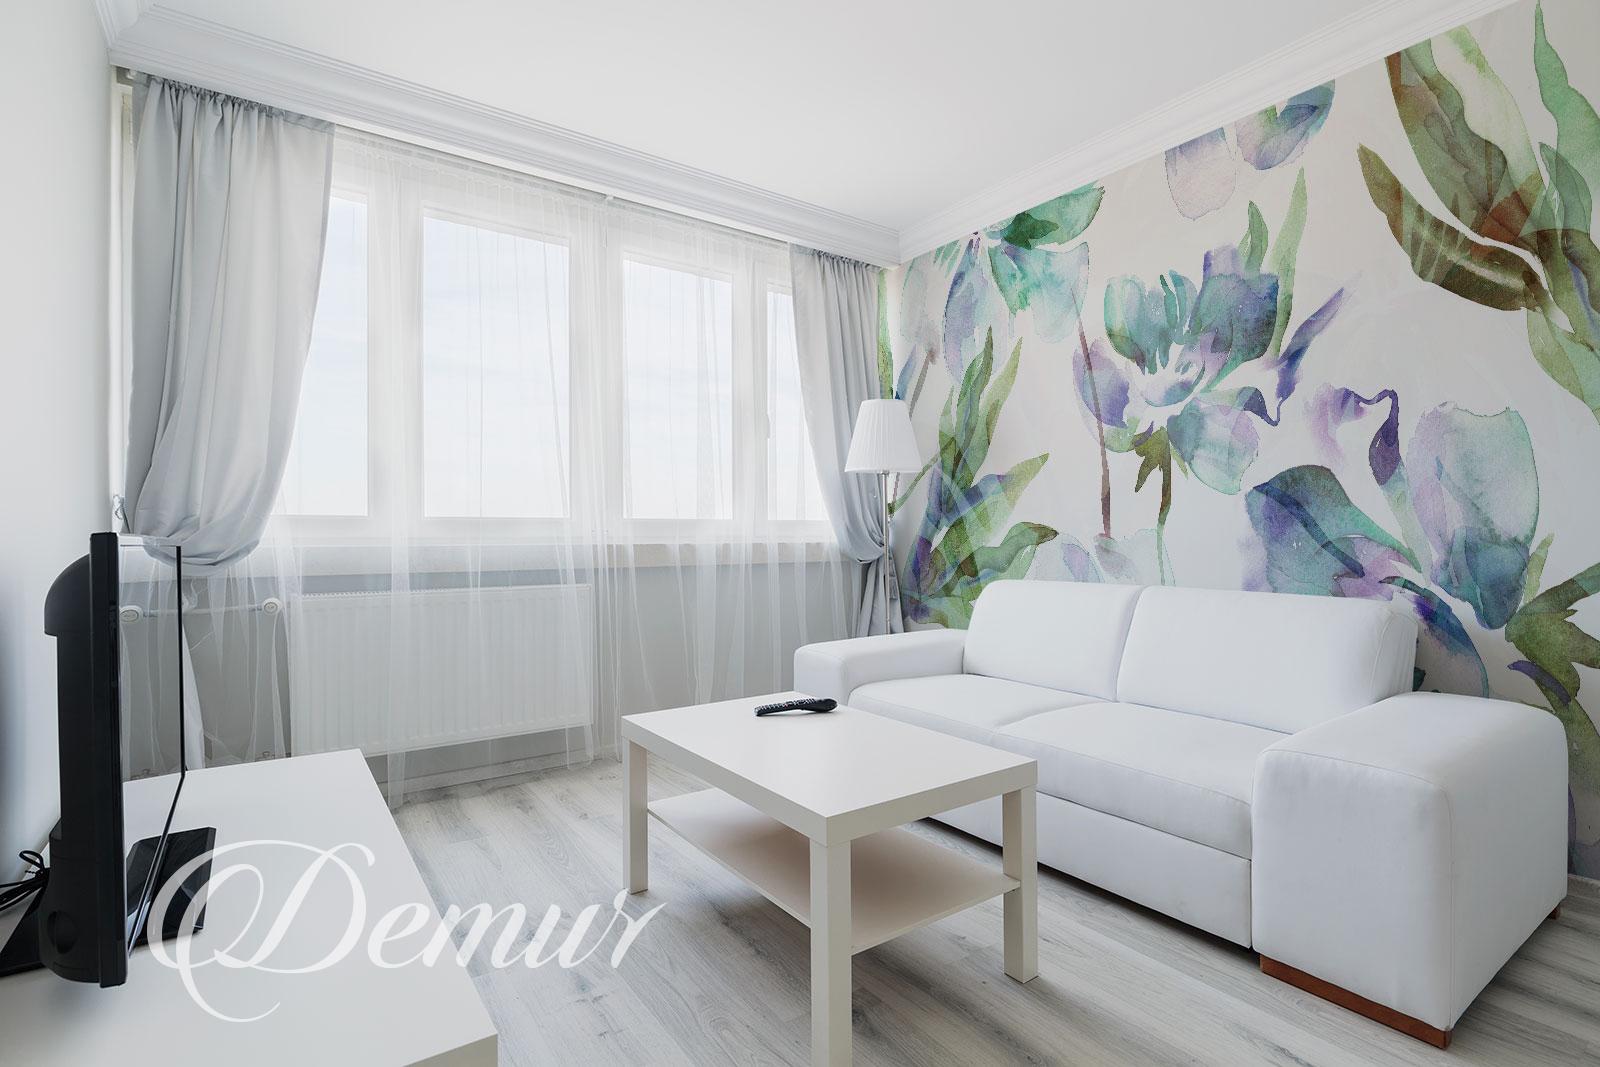 Fototapeta - Kwiaty Akwarele - Fototapeta do małego salonu - Demur